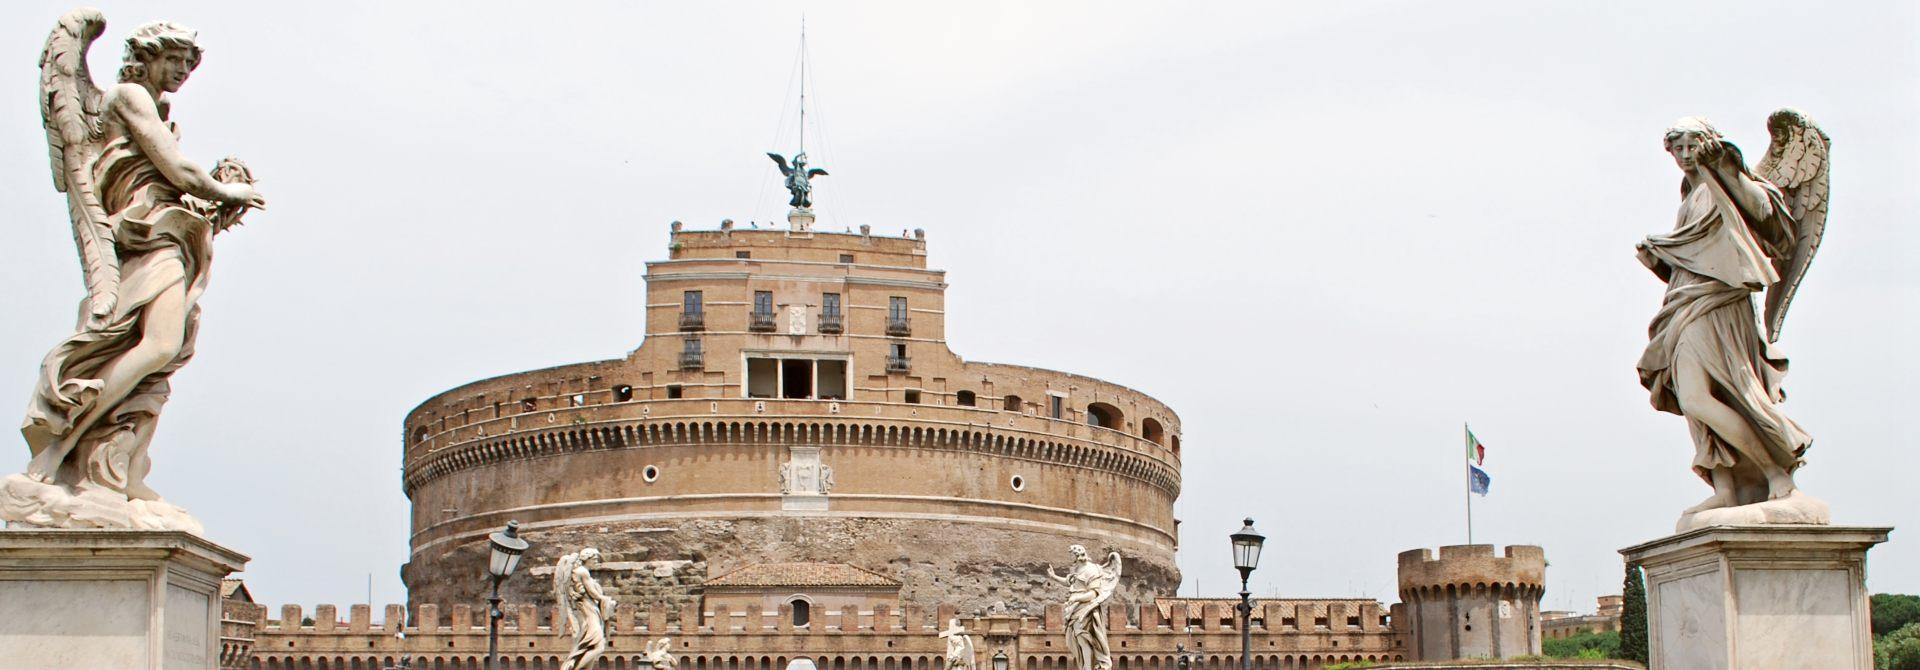 Castel Sant Angelo Header